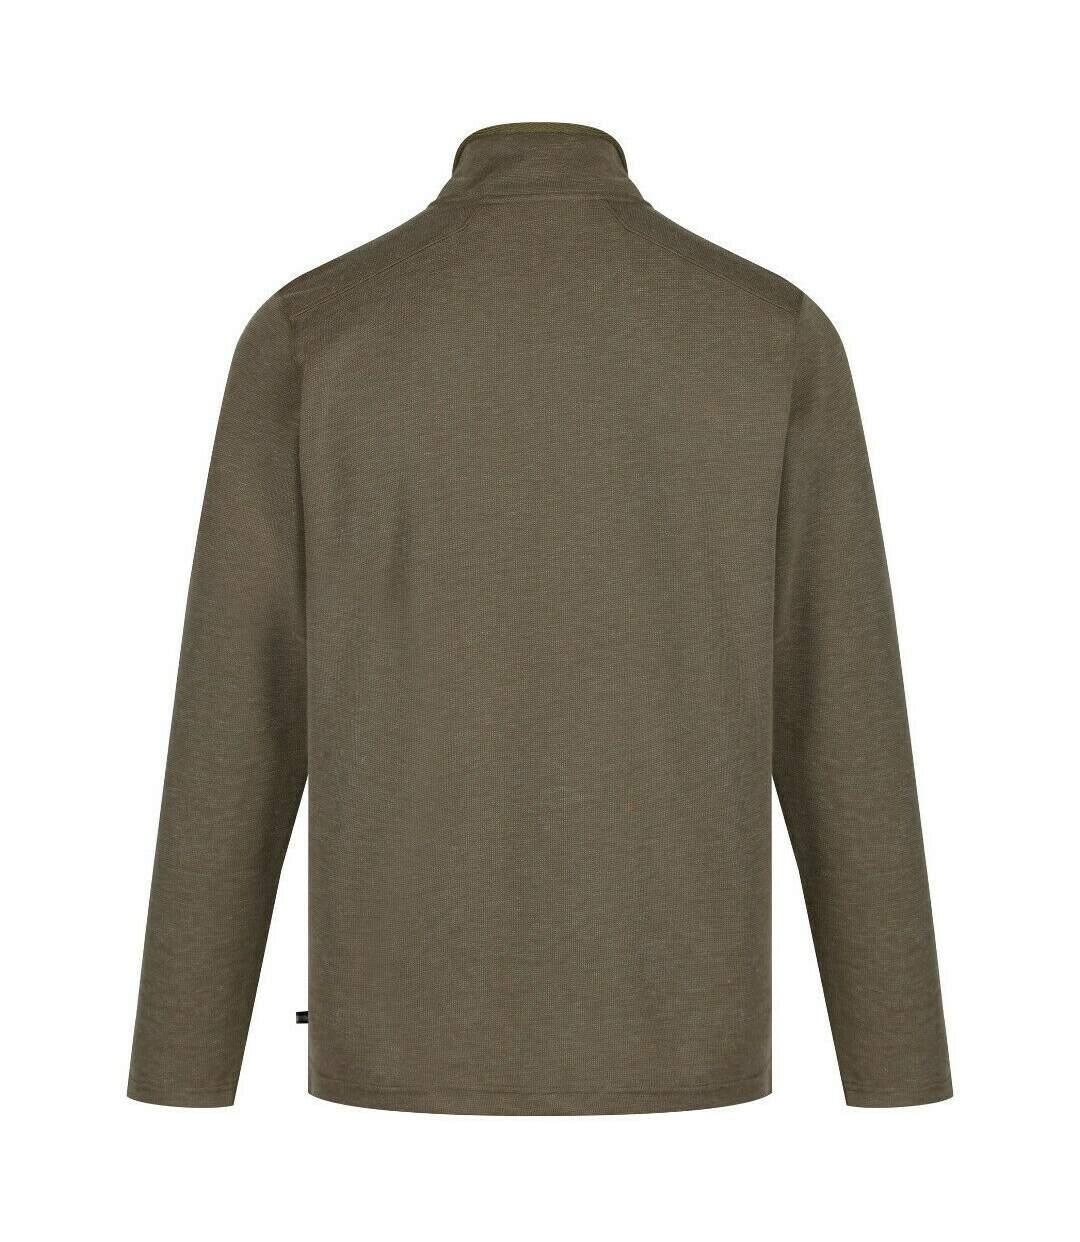 Regatta Mens Tarian Half Zip Fleece (Grape Leaf) - UTRG4185